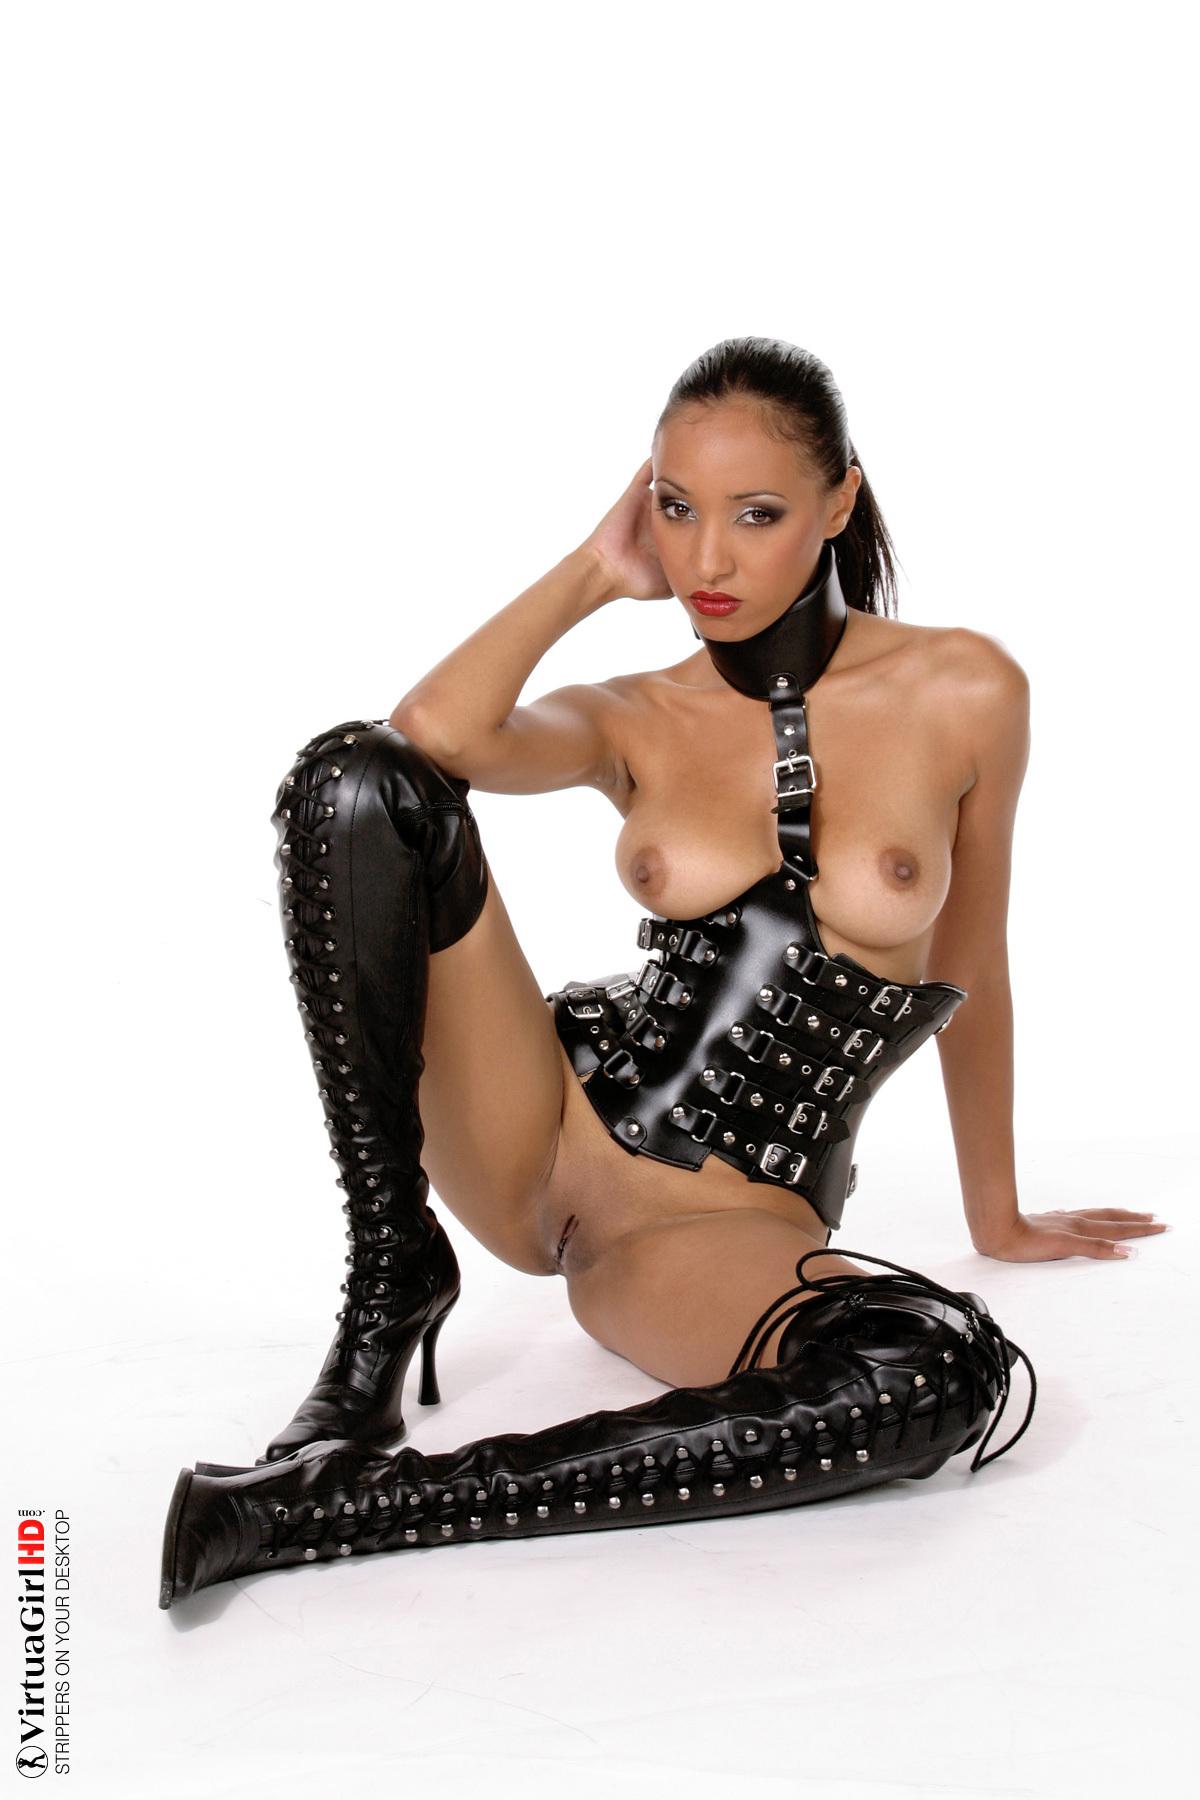 hd nude erotic cosplay wallpaper